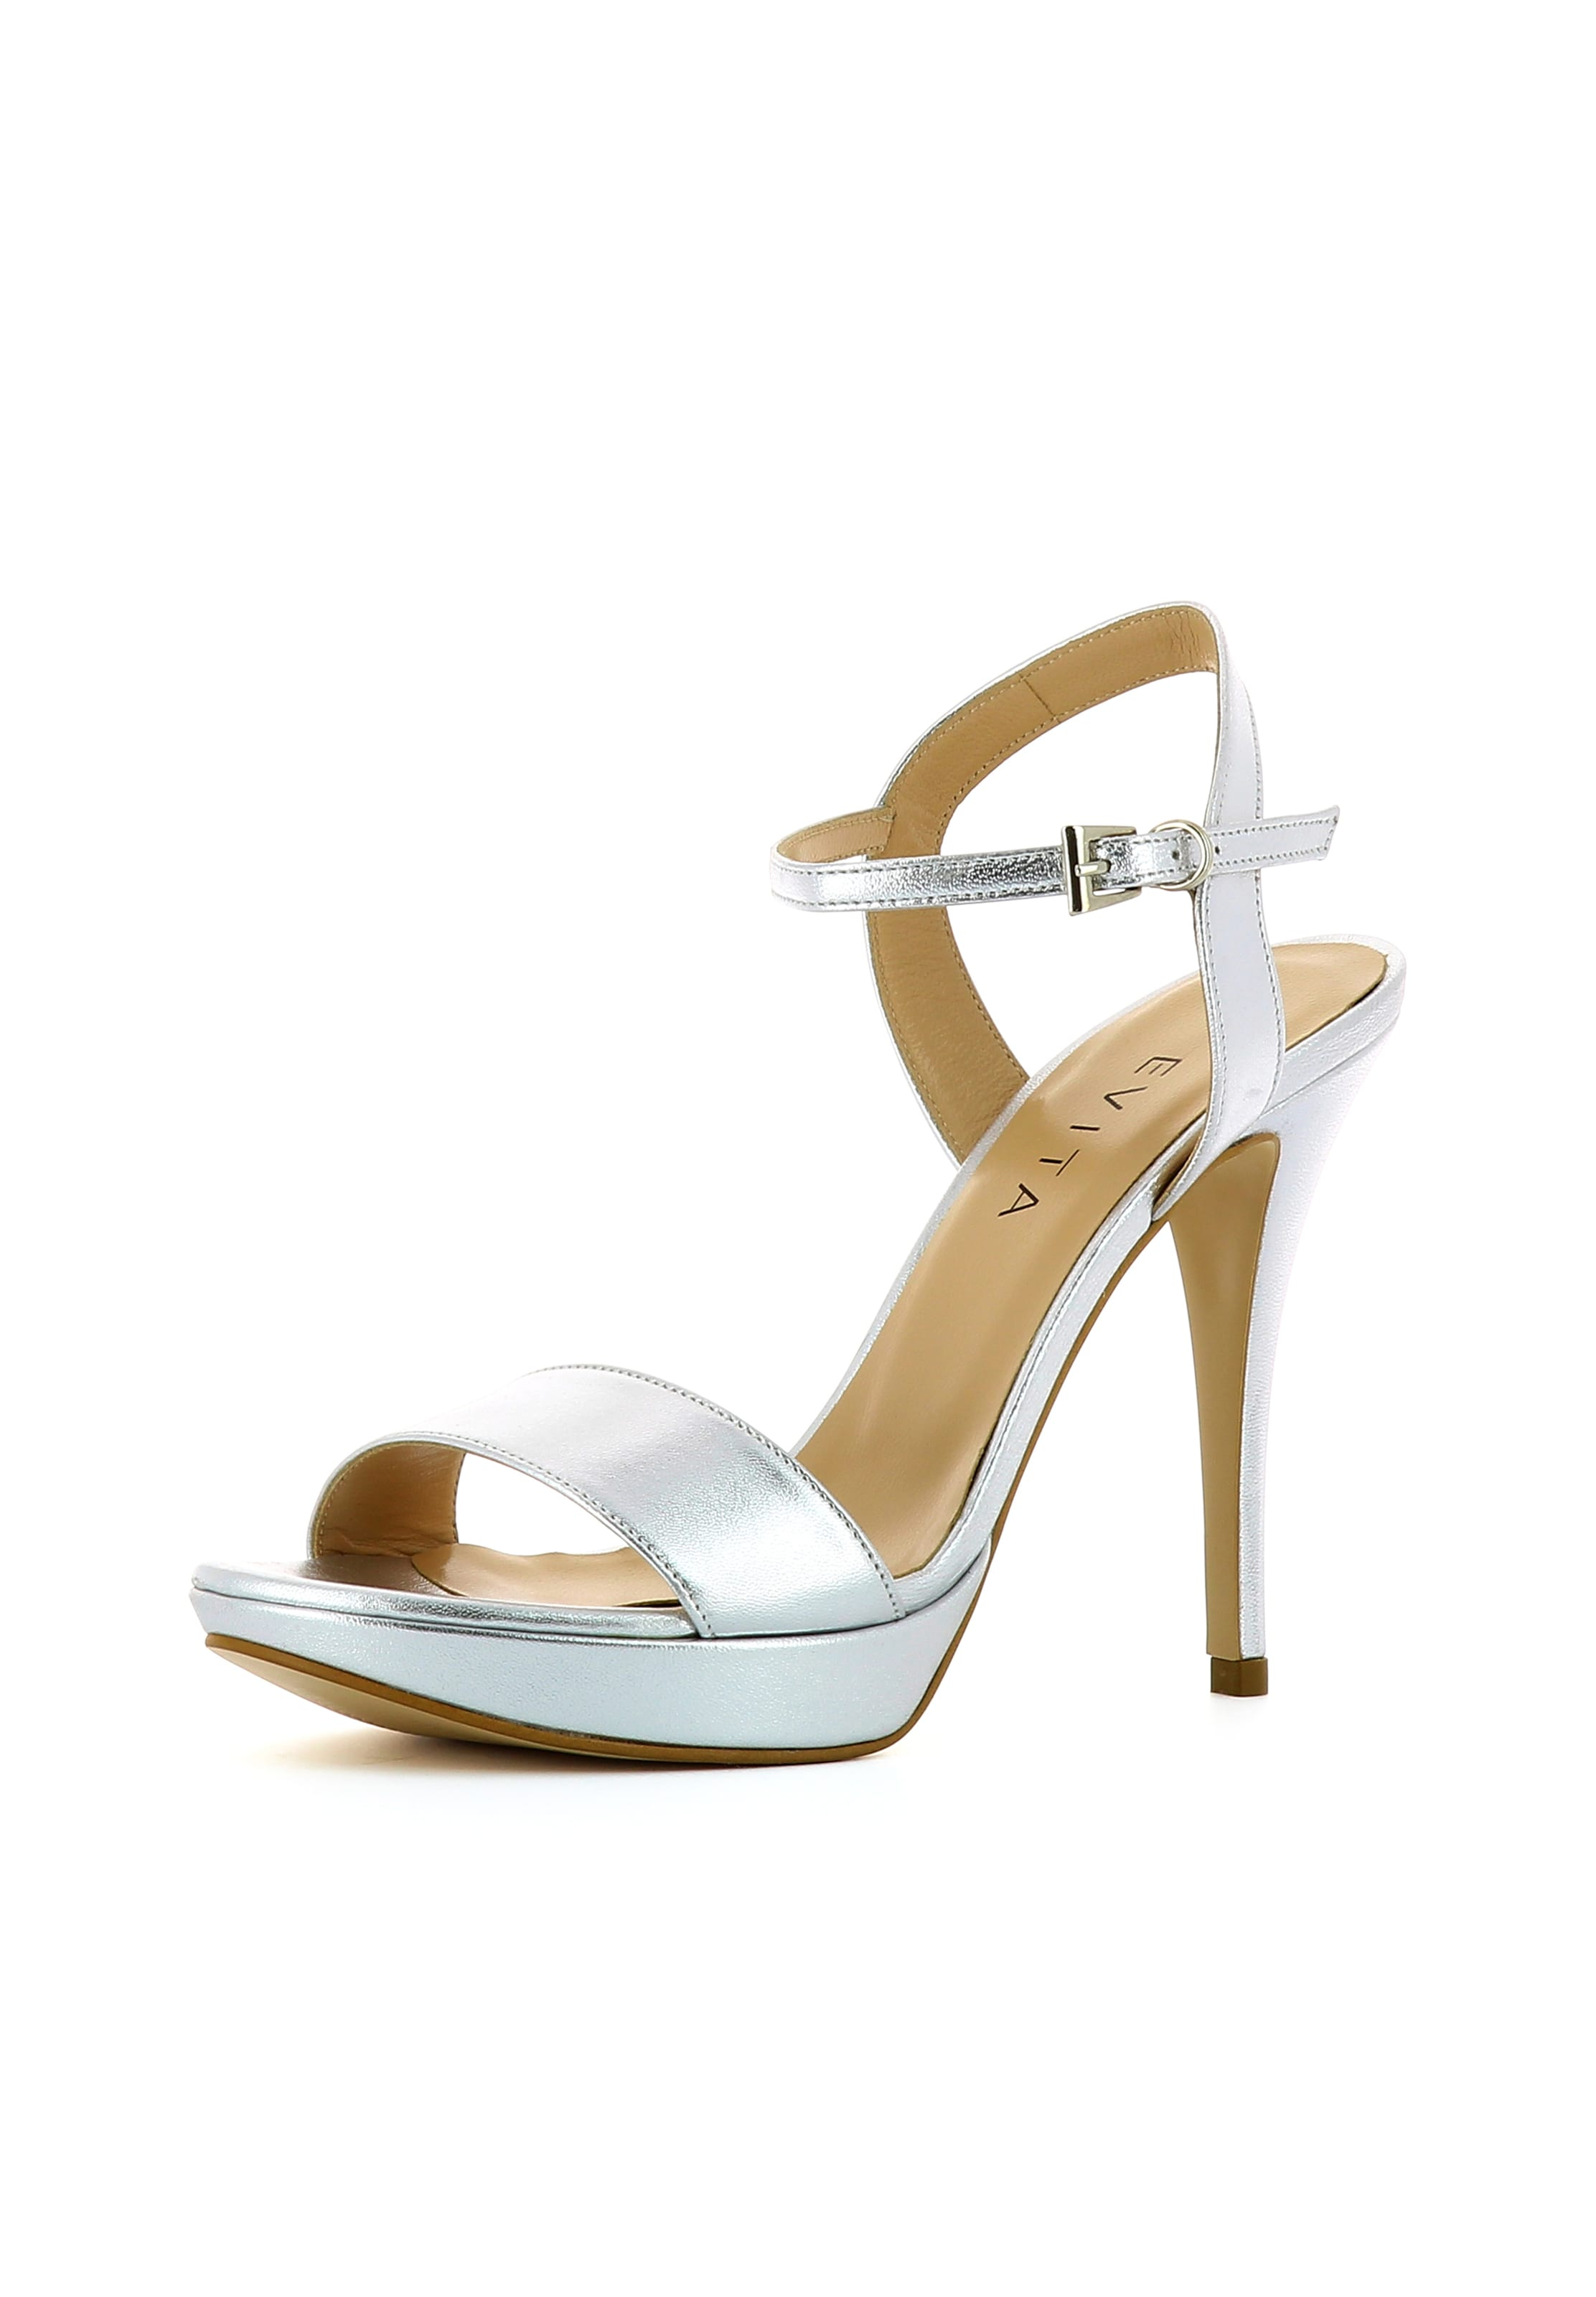 Haltbare Mode billige Schuhe EVITA   Damen Sandalette Schuhe Schuhe Schuhe Gut getragene Schuhe 129ae6